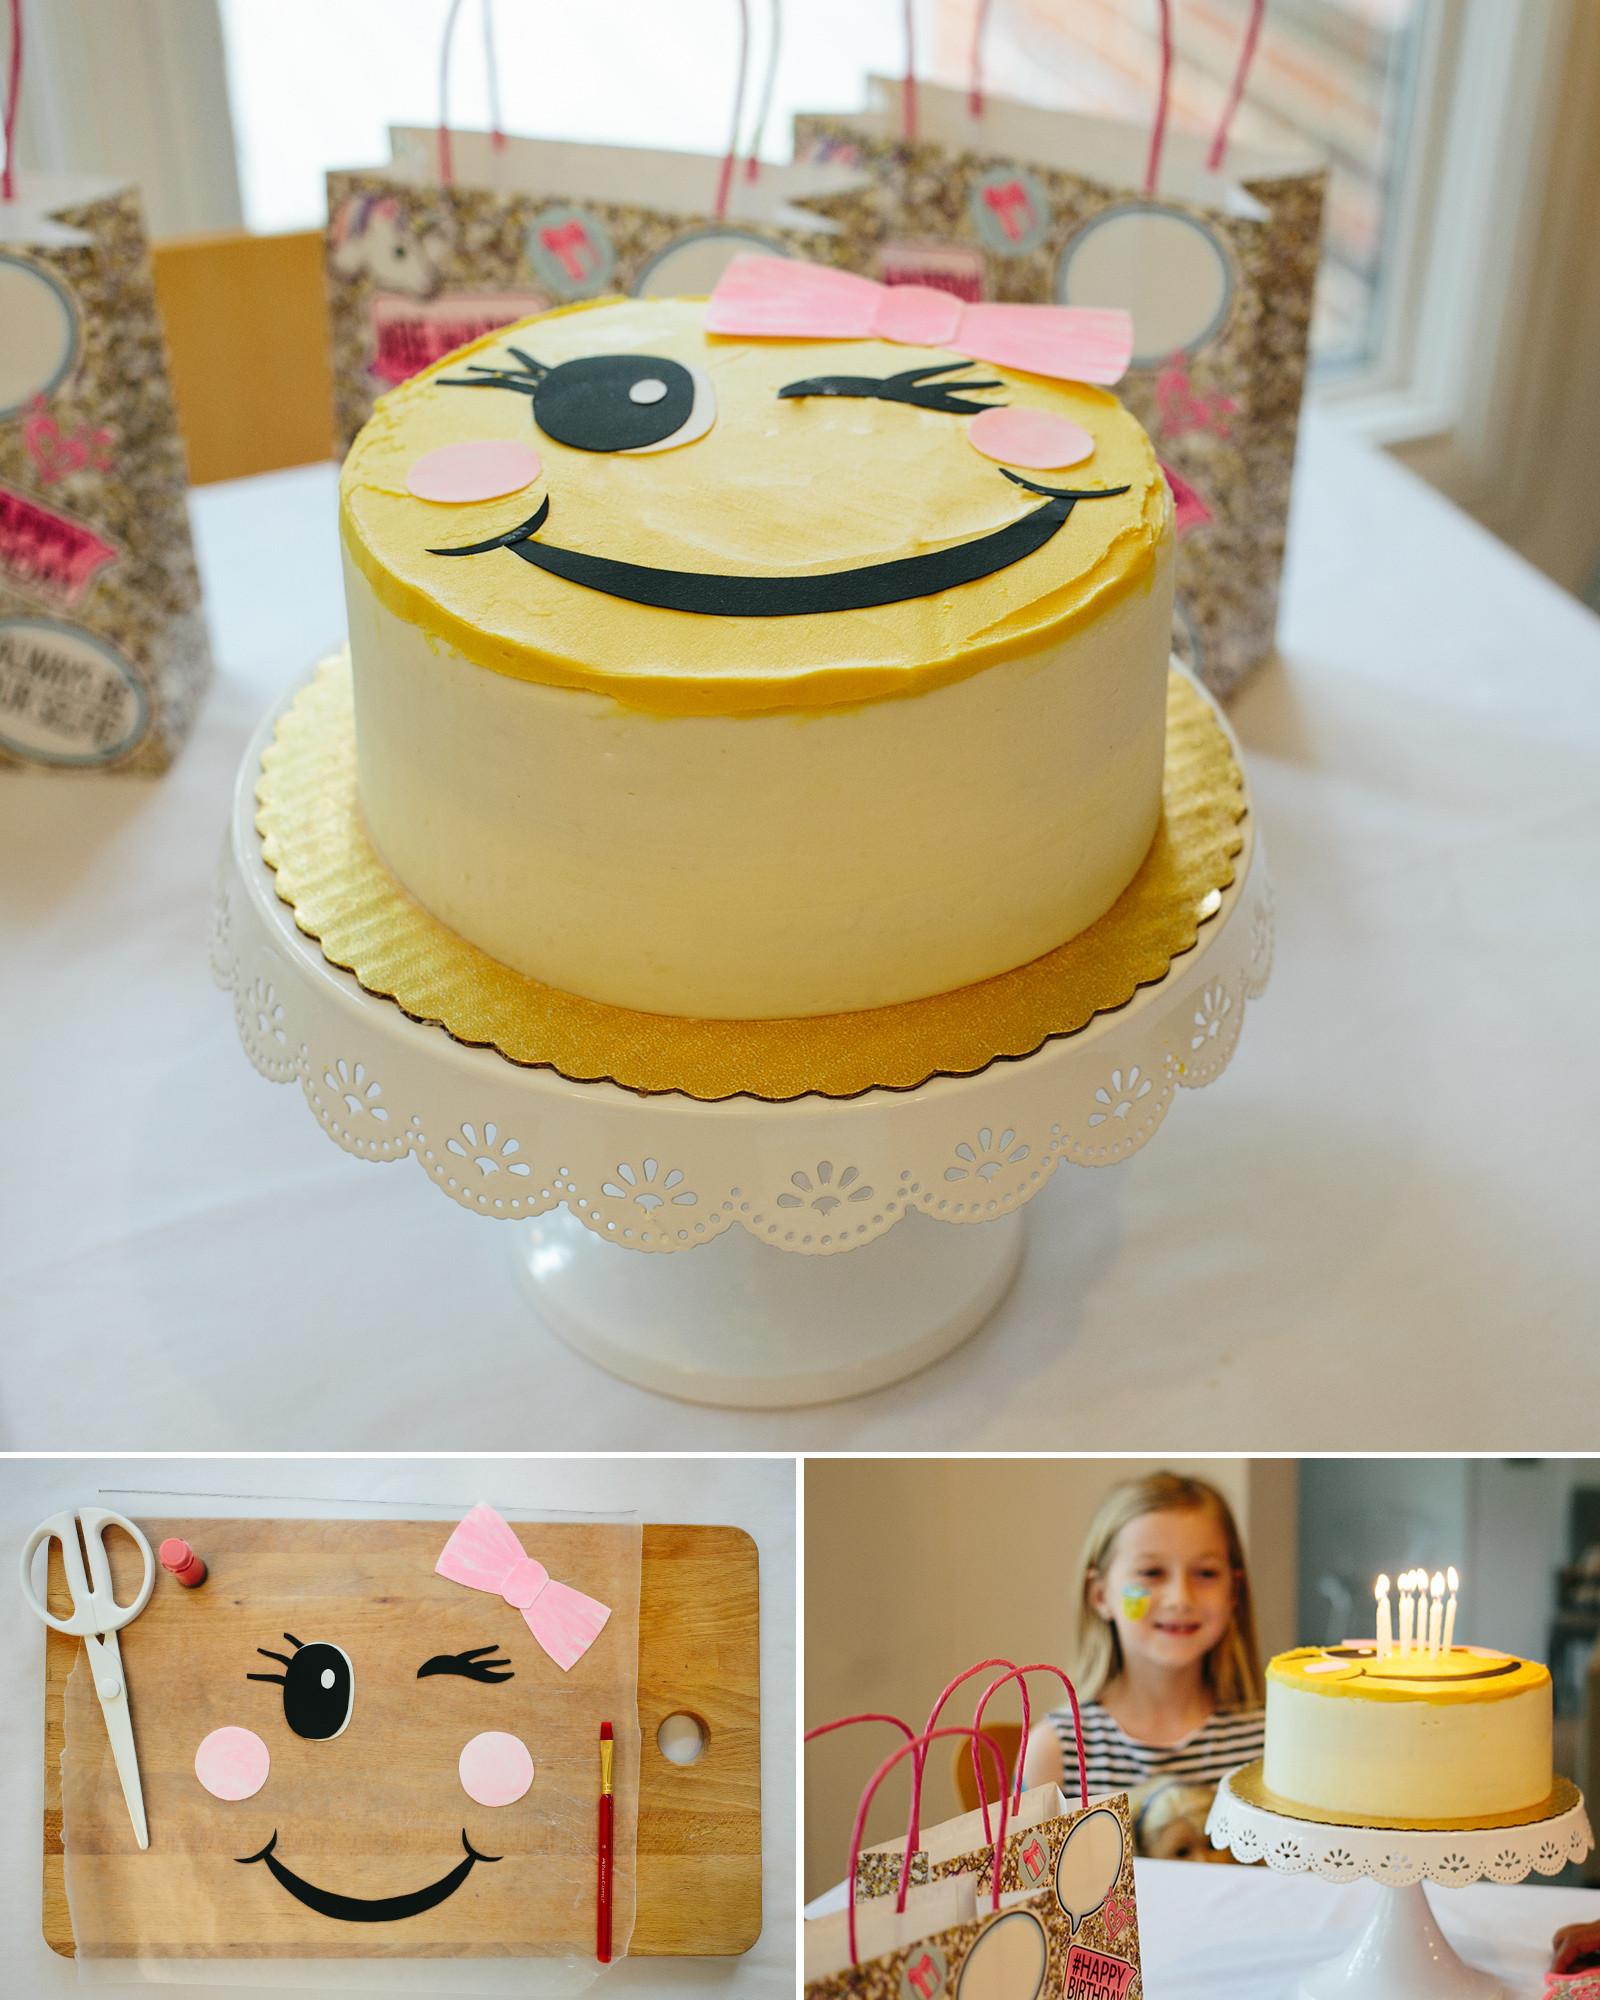 Best ideas about Emoji Birthday Cake . Save or Pin Emoji Birthday Party Now.